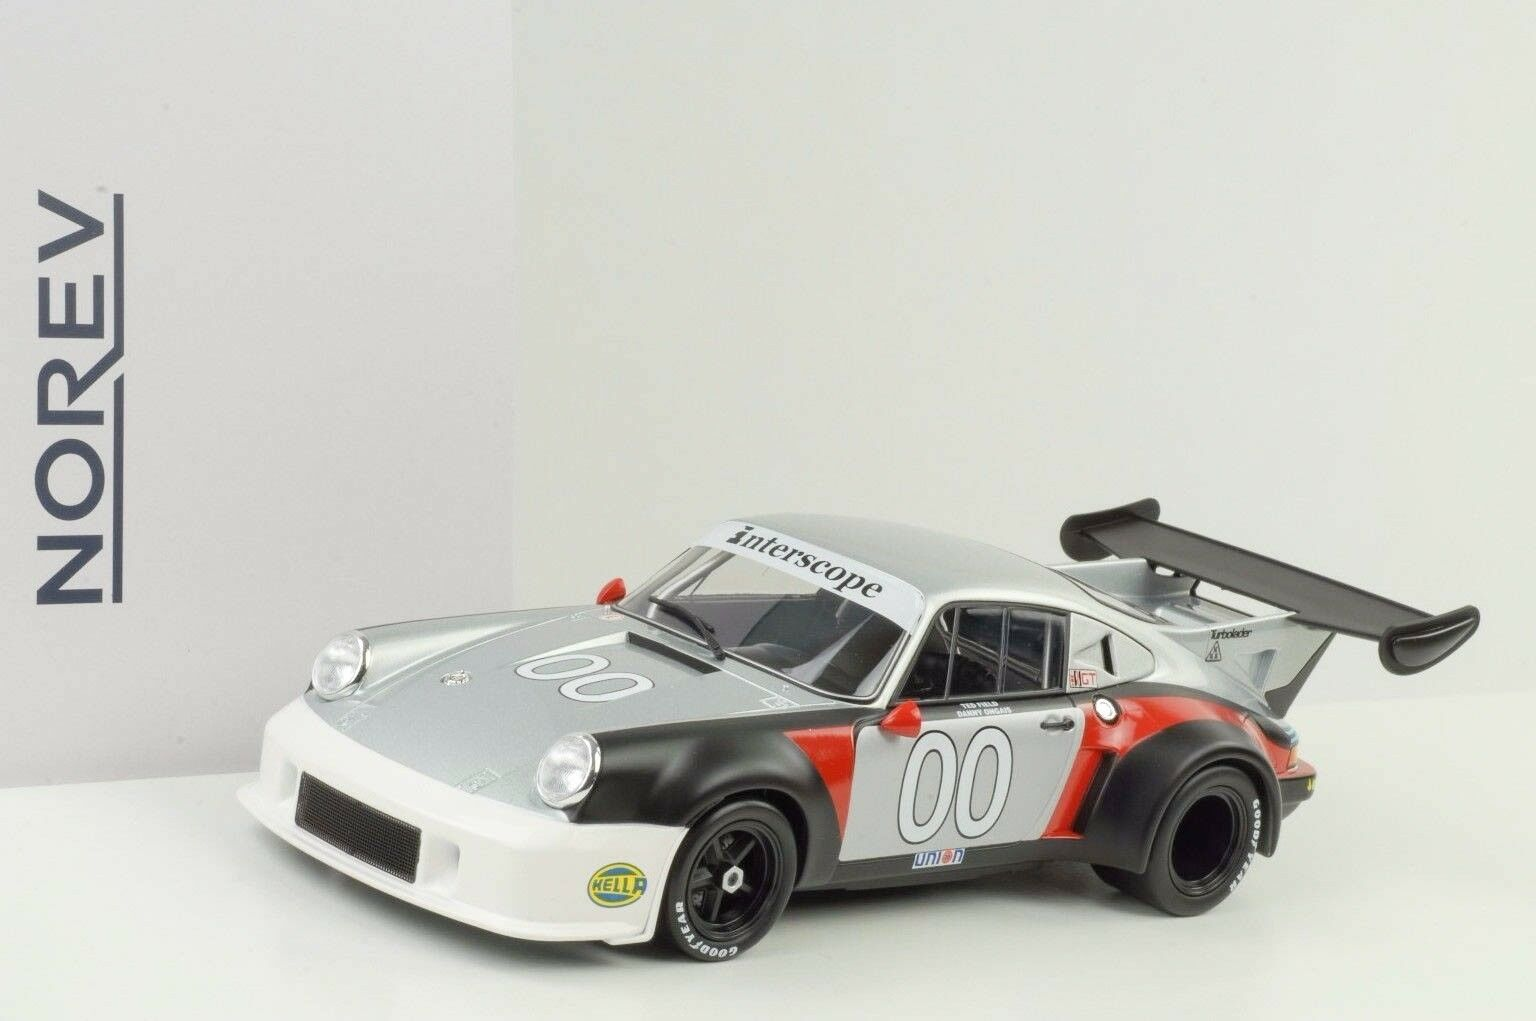 1977 Porsche 911 RSR turbo turbo turbo 2.1 H Daytona ogais Follmer Field 1 18 Norev 655656